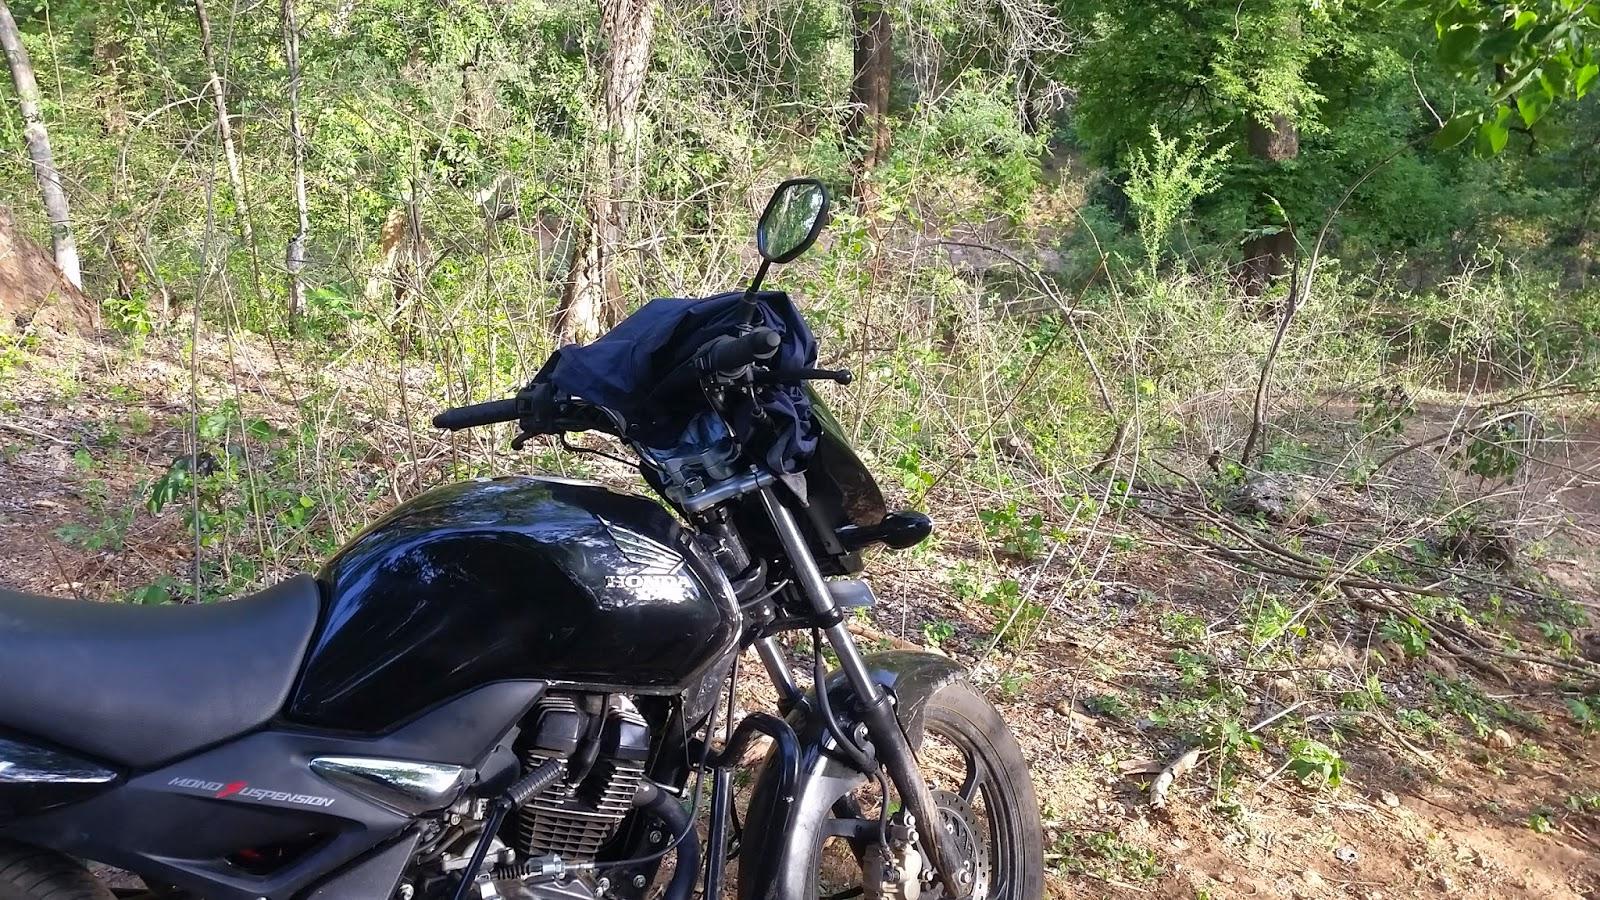 KALLI VALLI : Biligundlu,Man And Machine Trip- Part 10(The